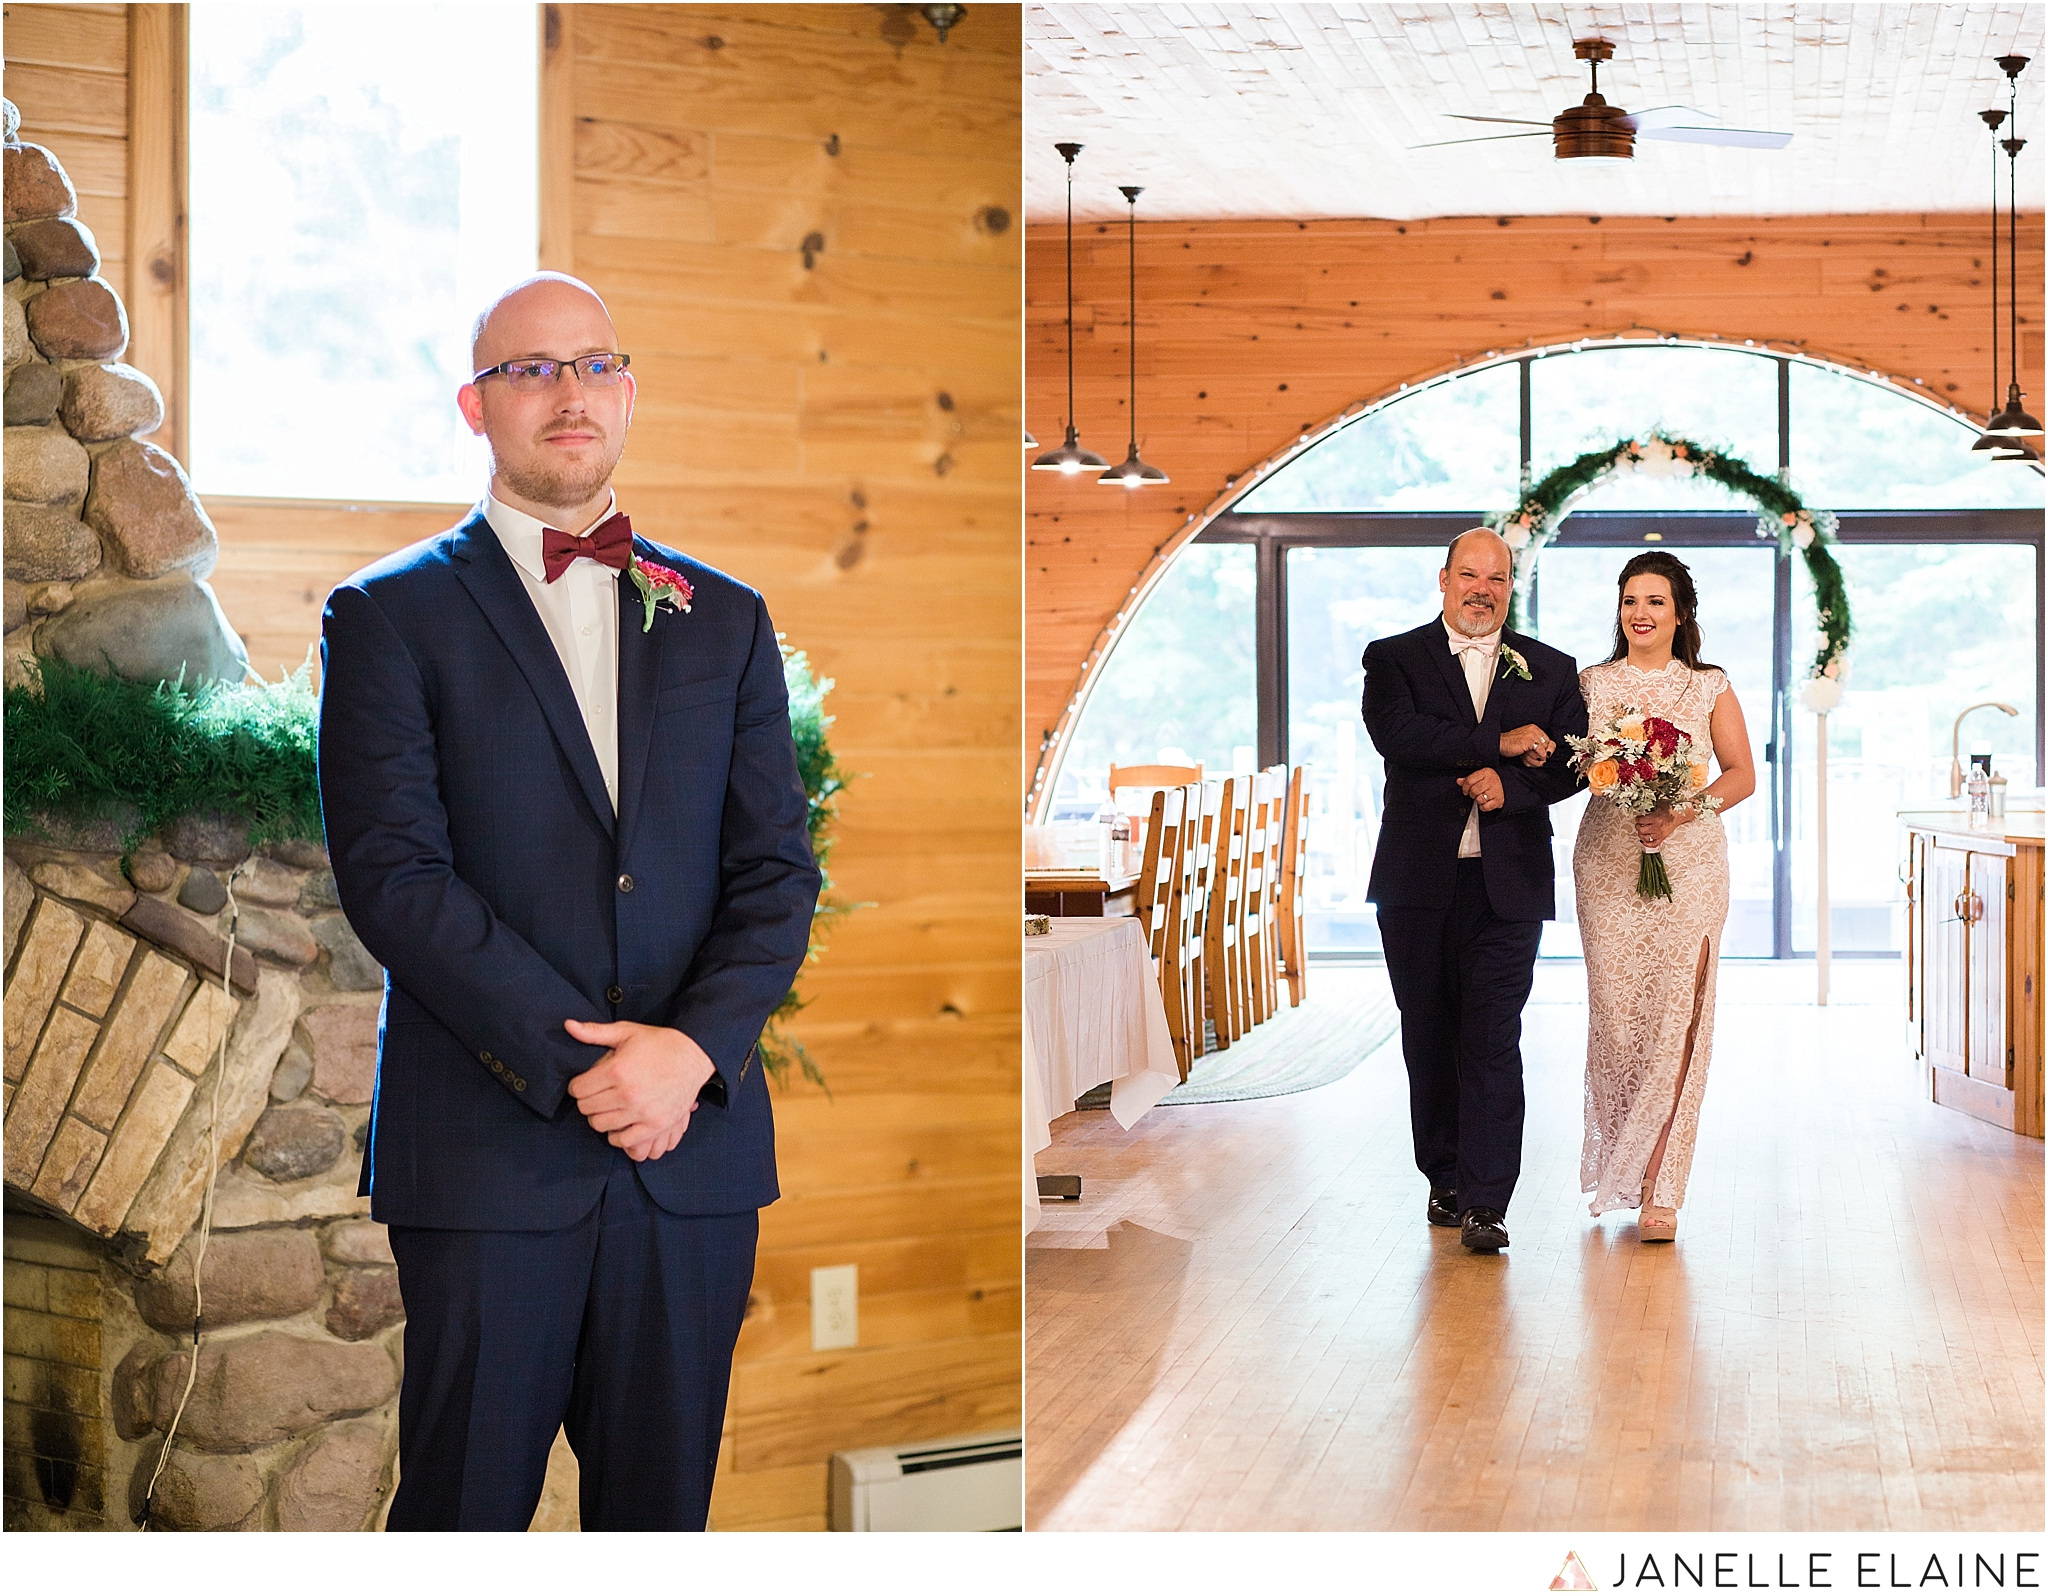 janelle elaine photography-seattle-destination-wedding-photographer-52.jpg